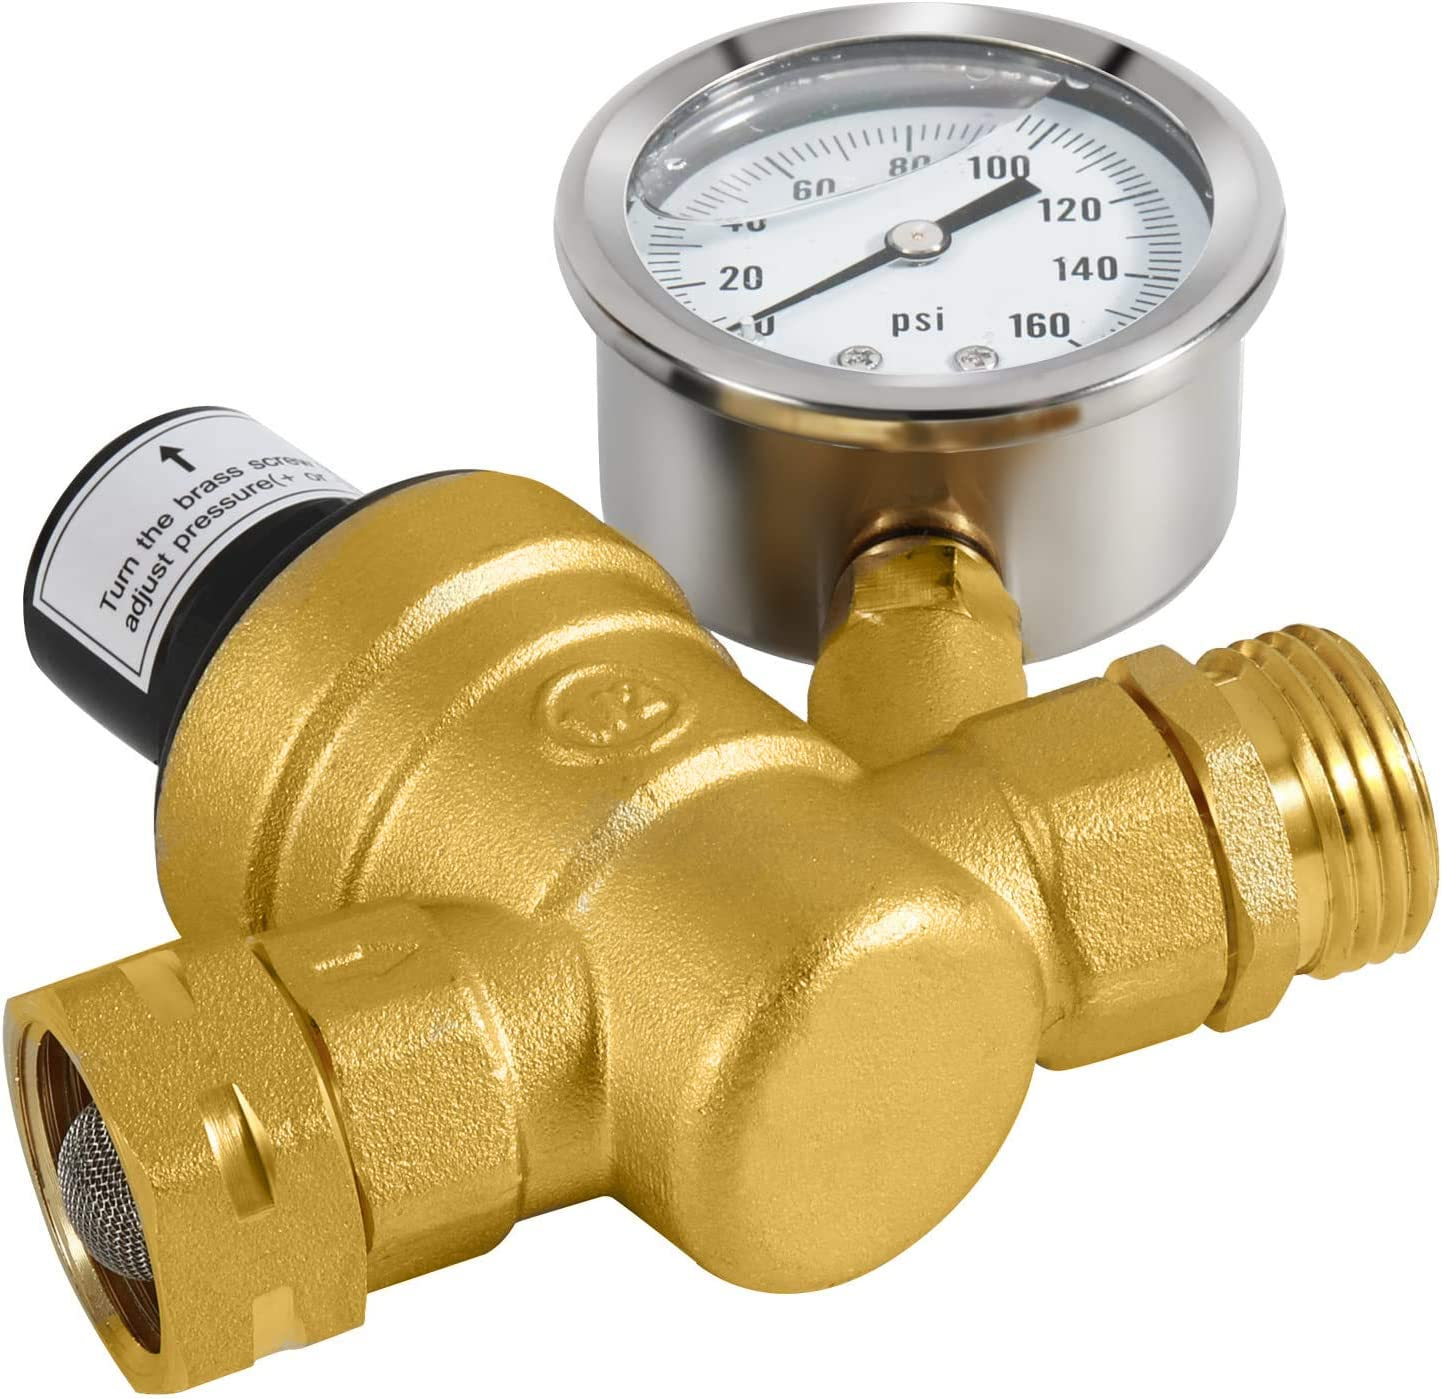 Brass Lead-Free Adjustable Water Pressure Reducer Valve with Gauge and Inlet Screen Filters for RV Camper Travel Trailer beduan RV Water Pressure Regulator Valve